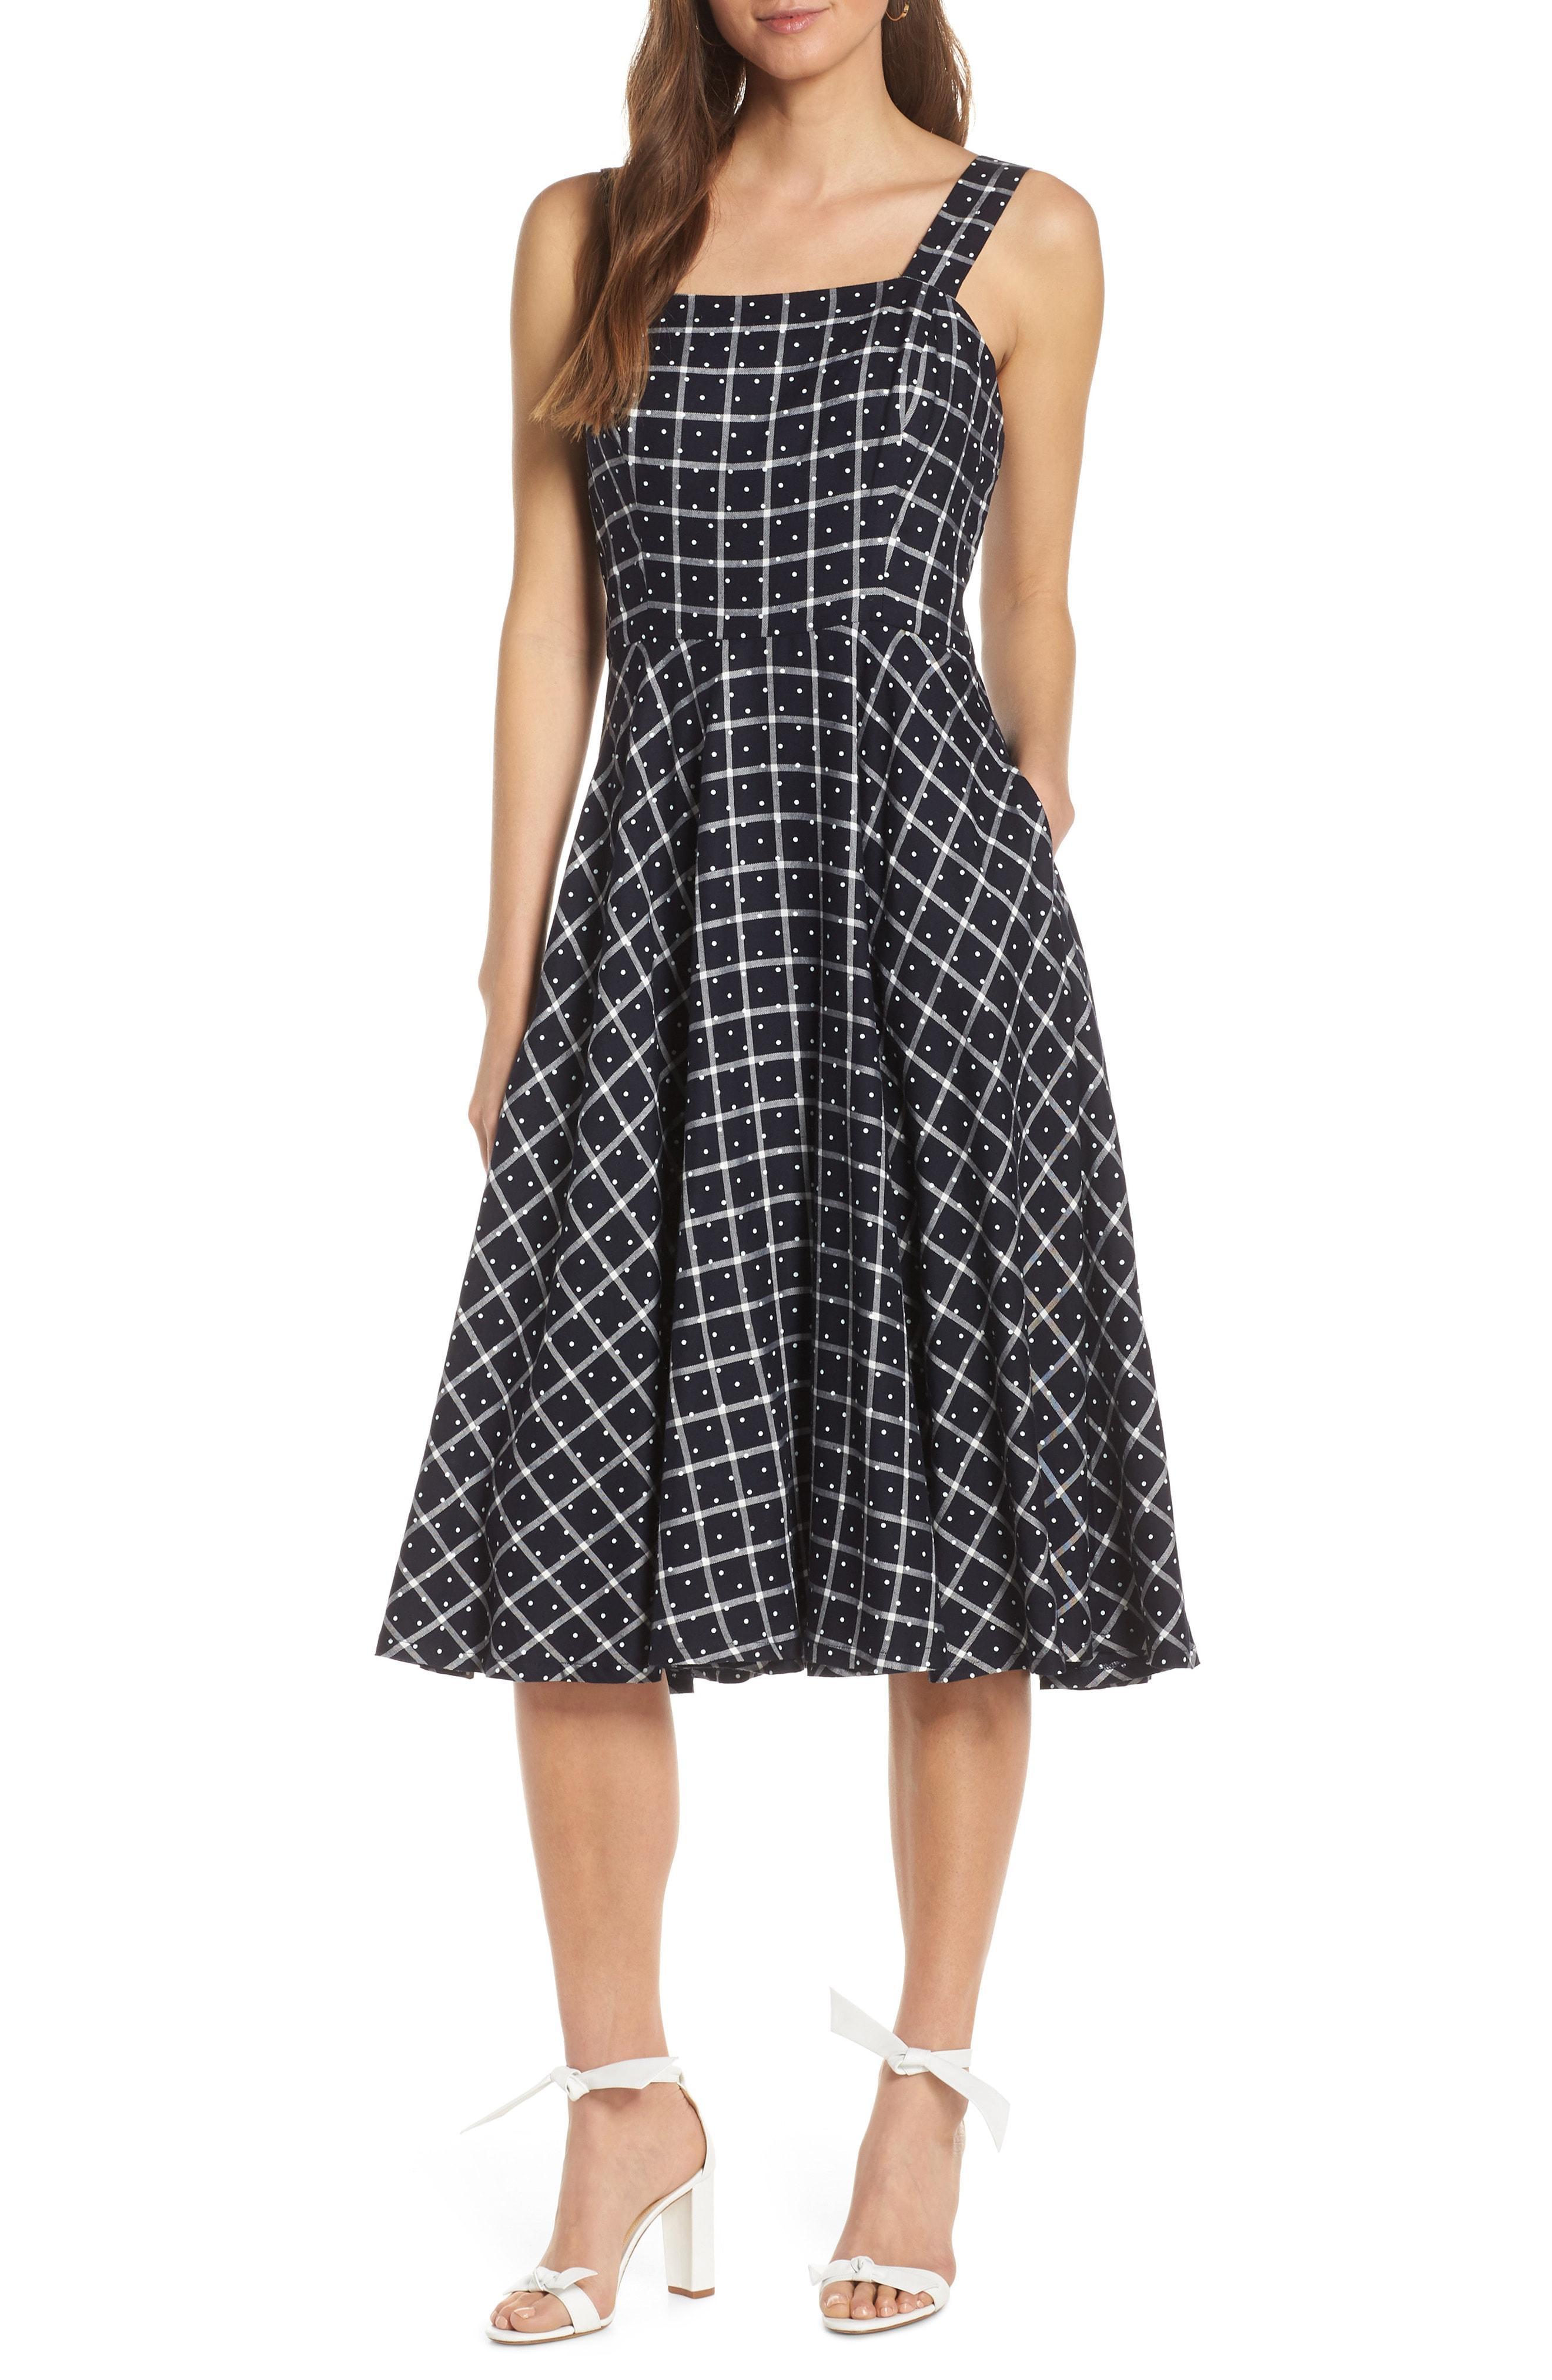 89684fb7fa4 Lyst - Nordstrom 1901 Windowpane Check Fit   Flare Dress in Black